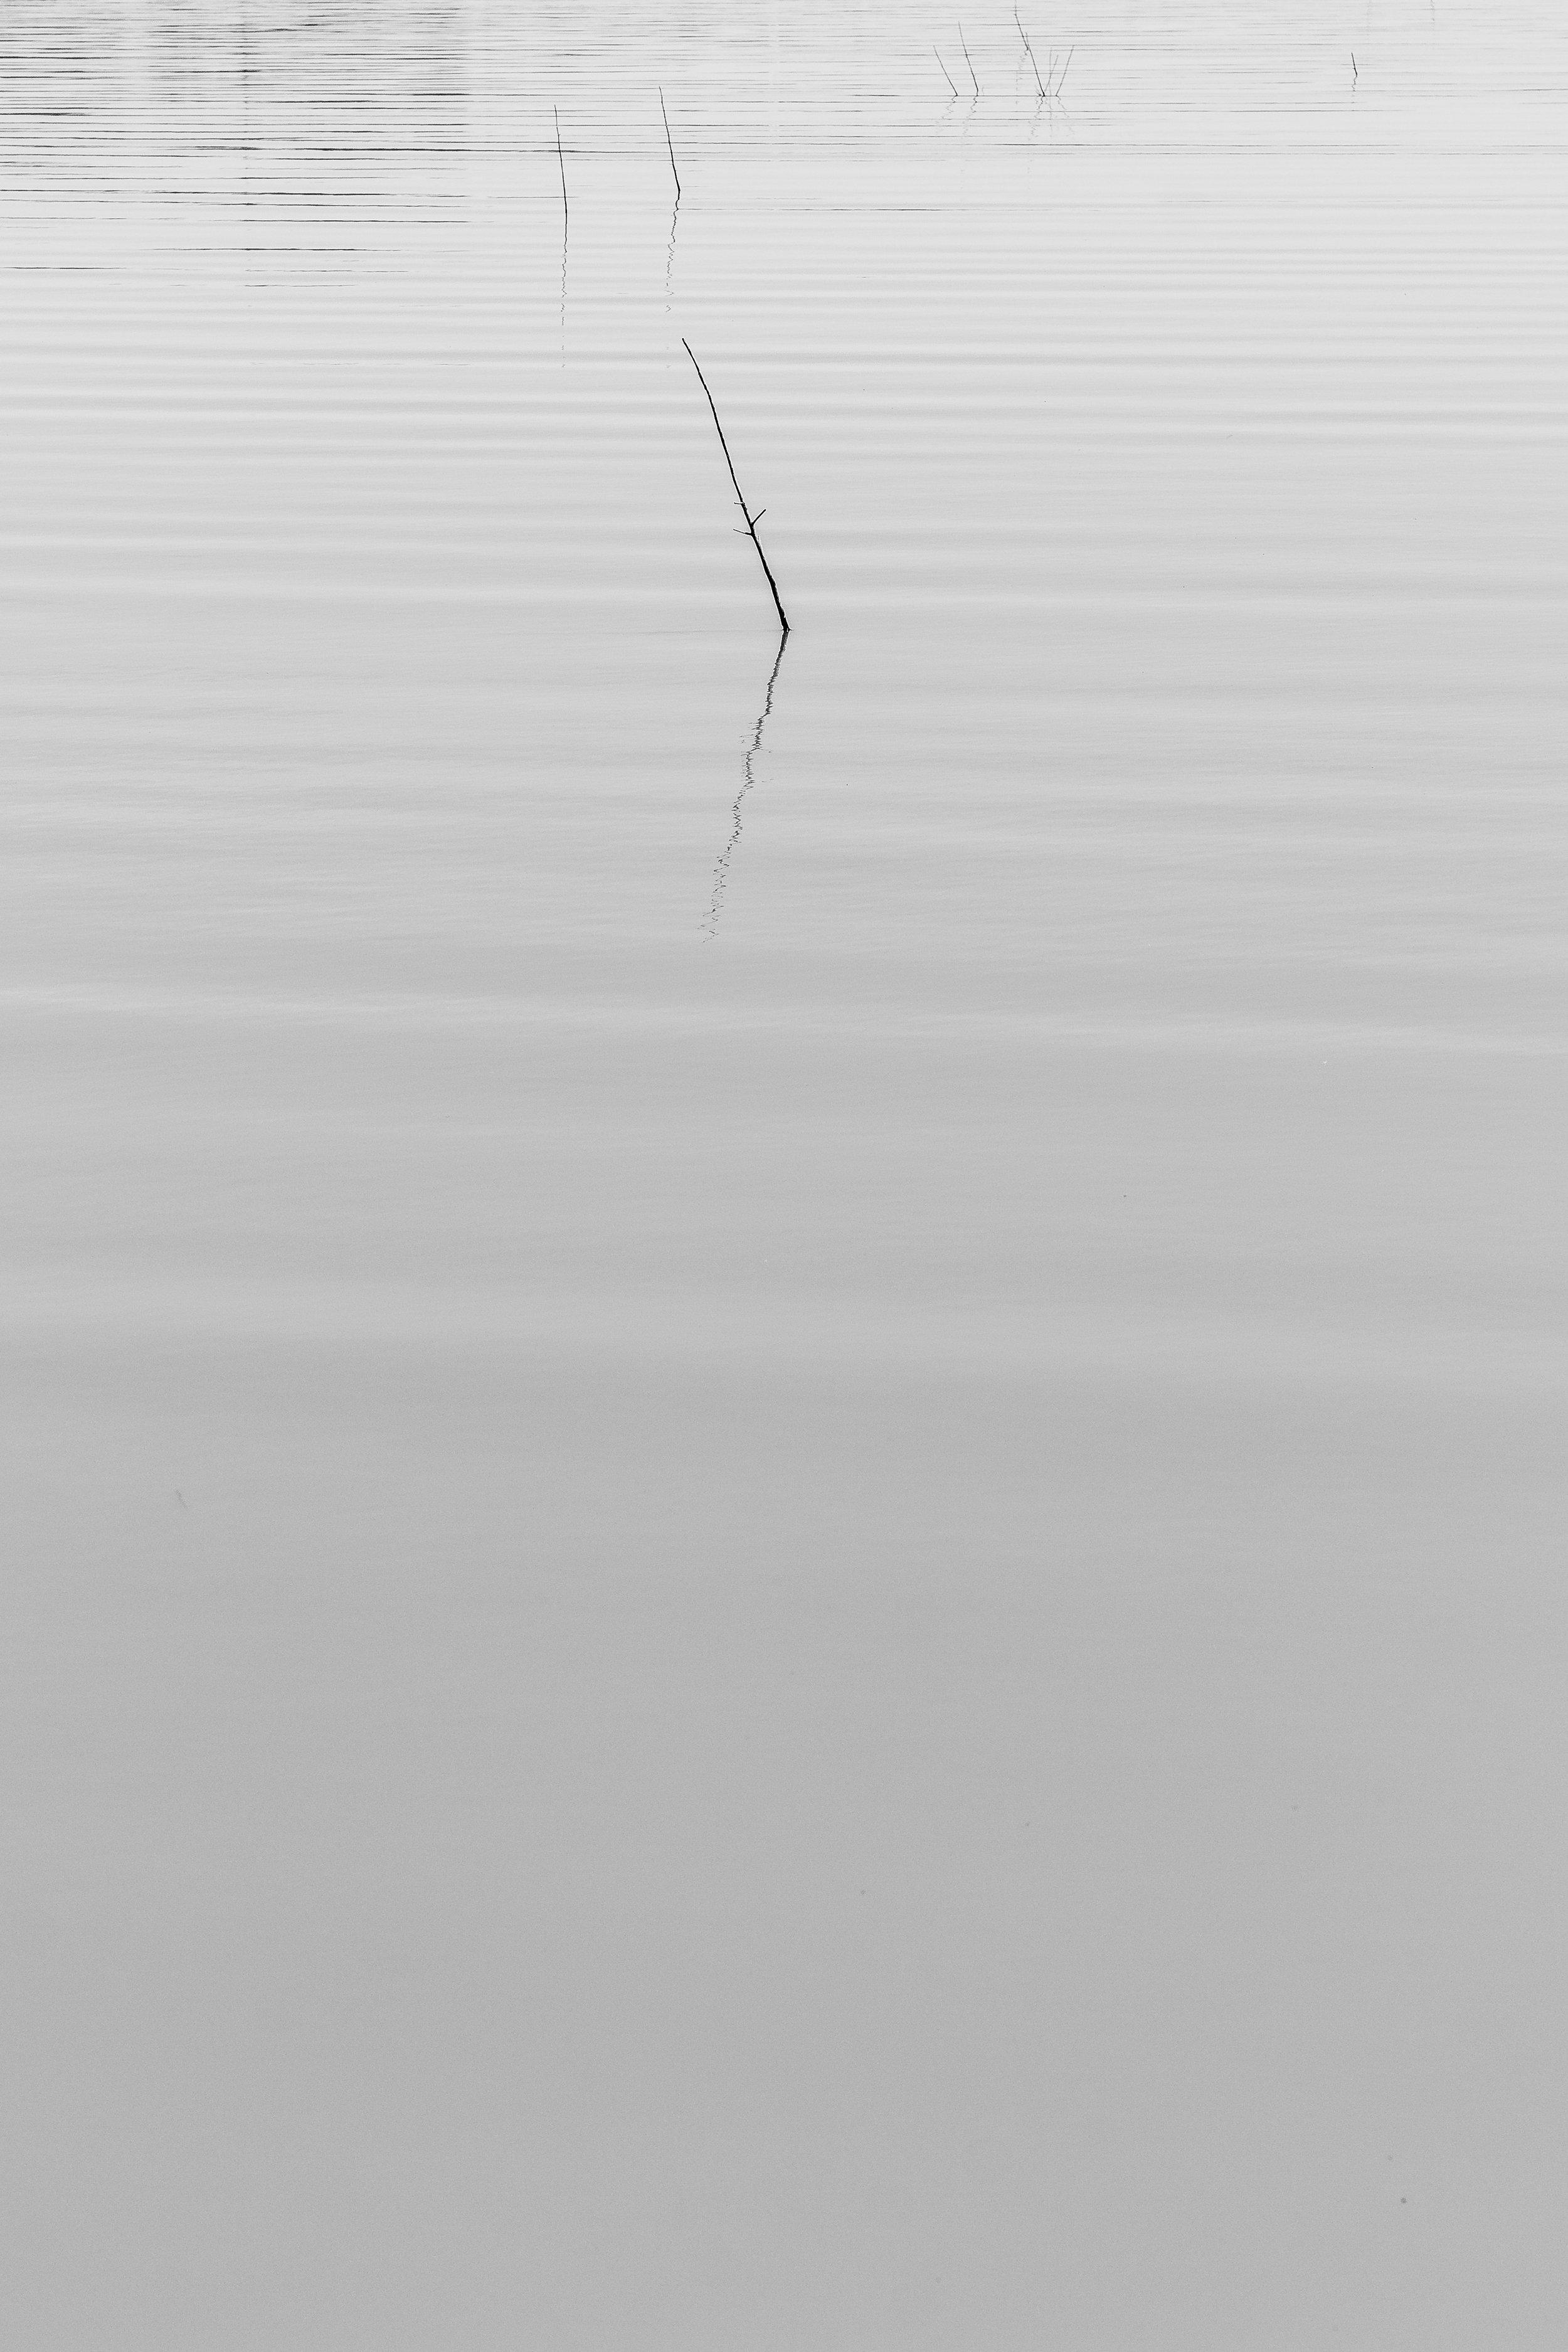 Lake Black and White Zen Minamilism Silence Quiet Wallpaper by Ken Treloar Photography-2.jpg